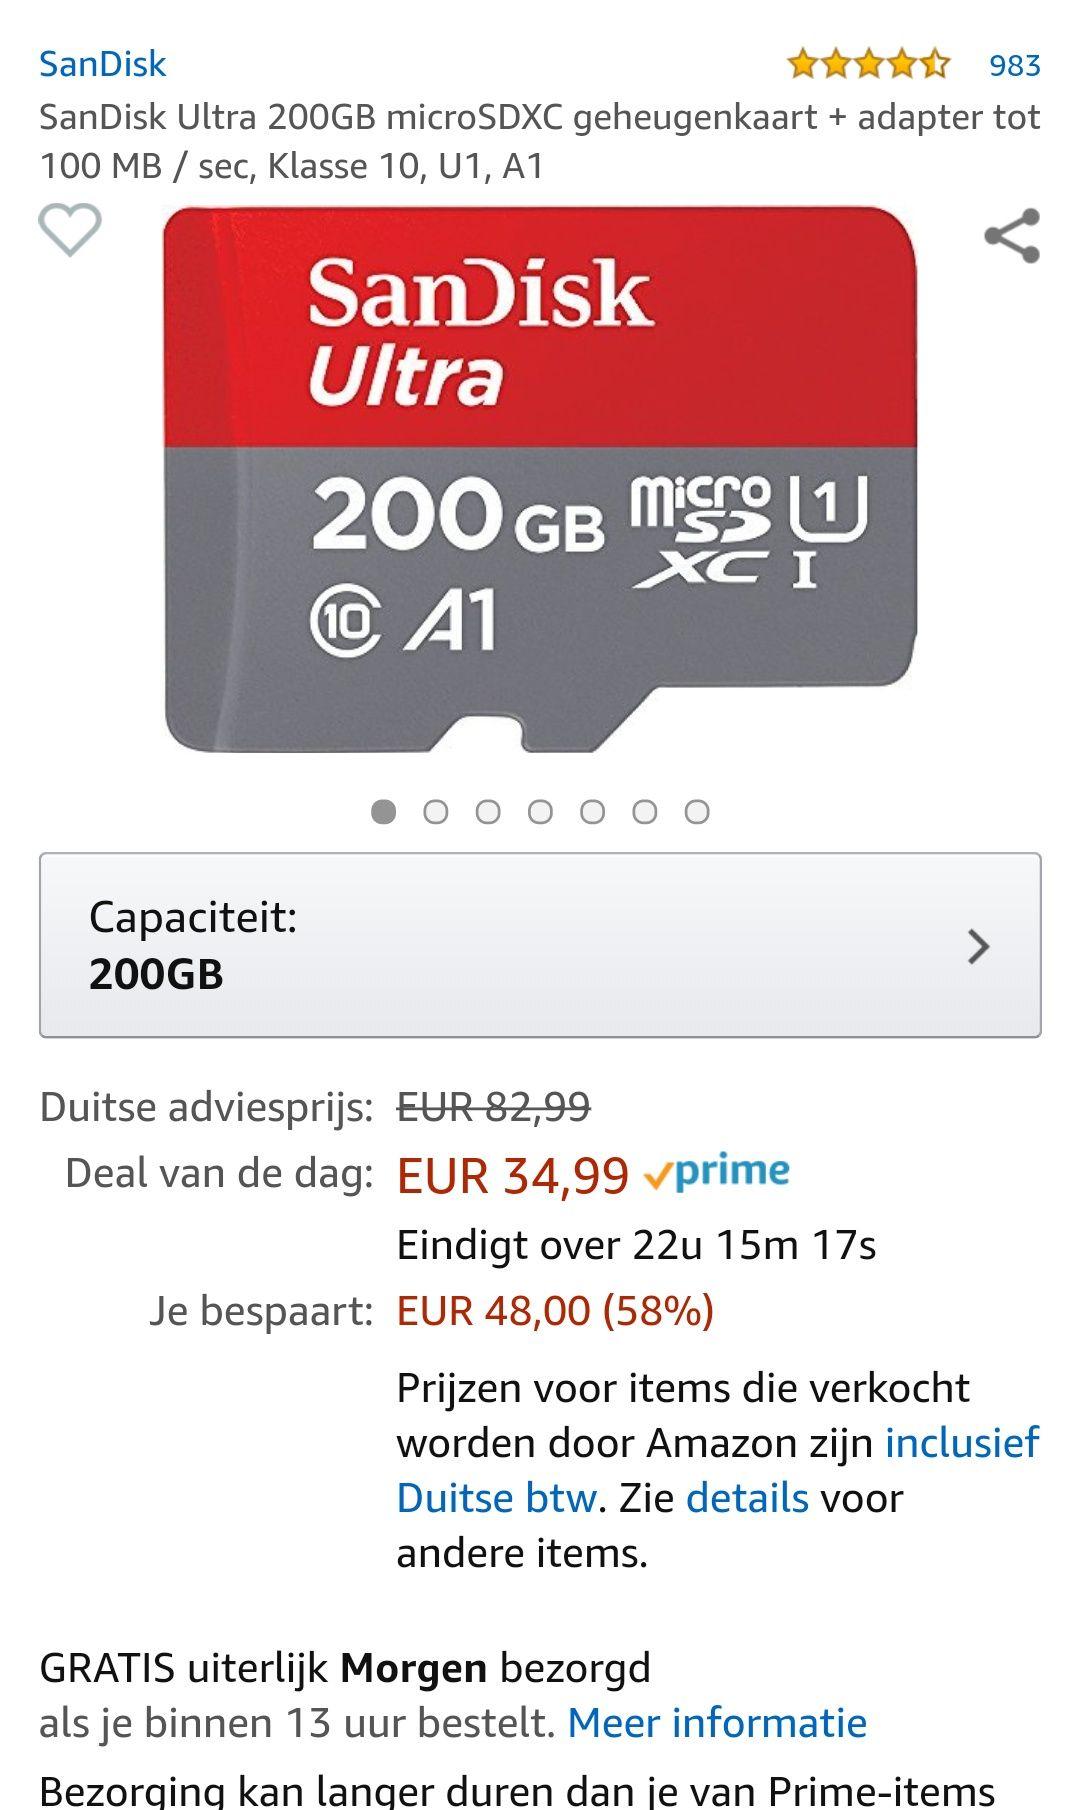 Amazon Prime daydeal: SanDisk Ultra 200GB microSDXC geheugenkaart + adapter